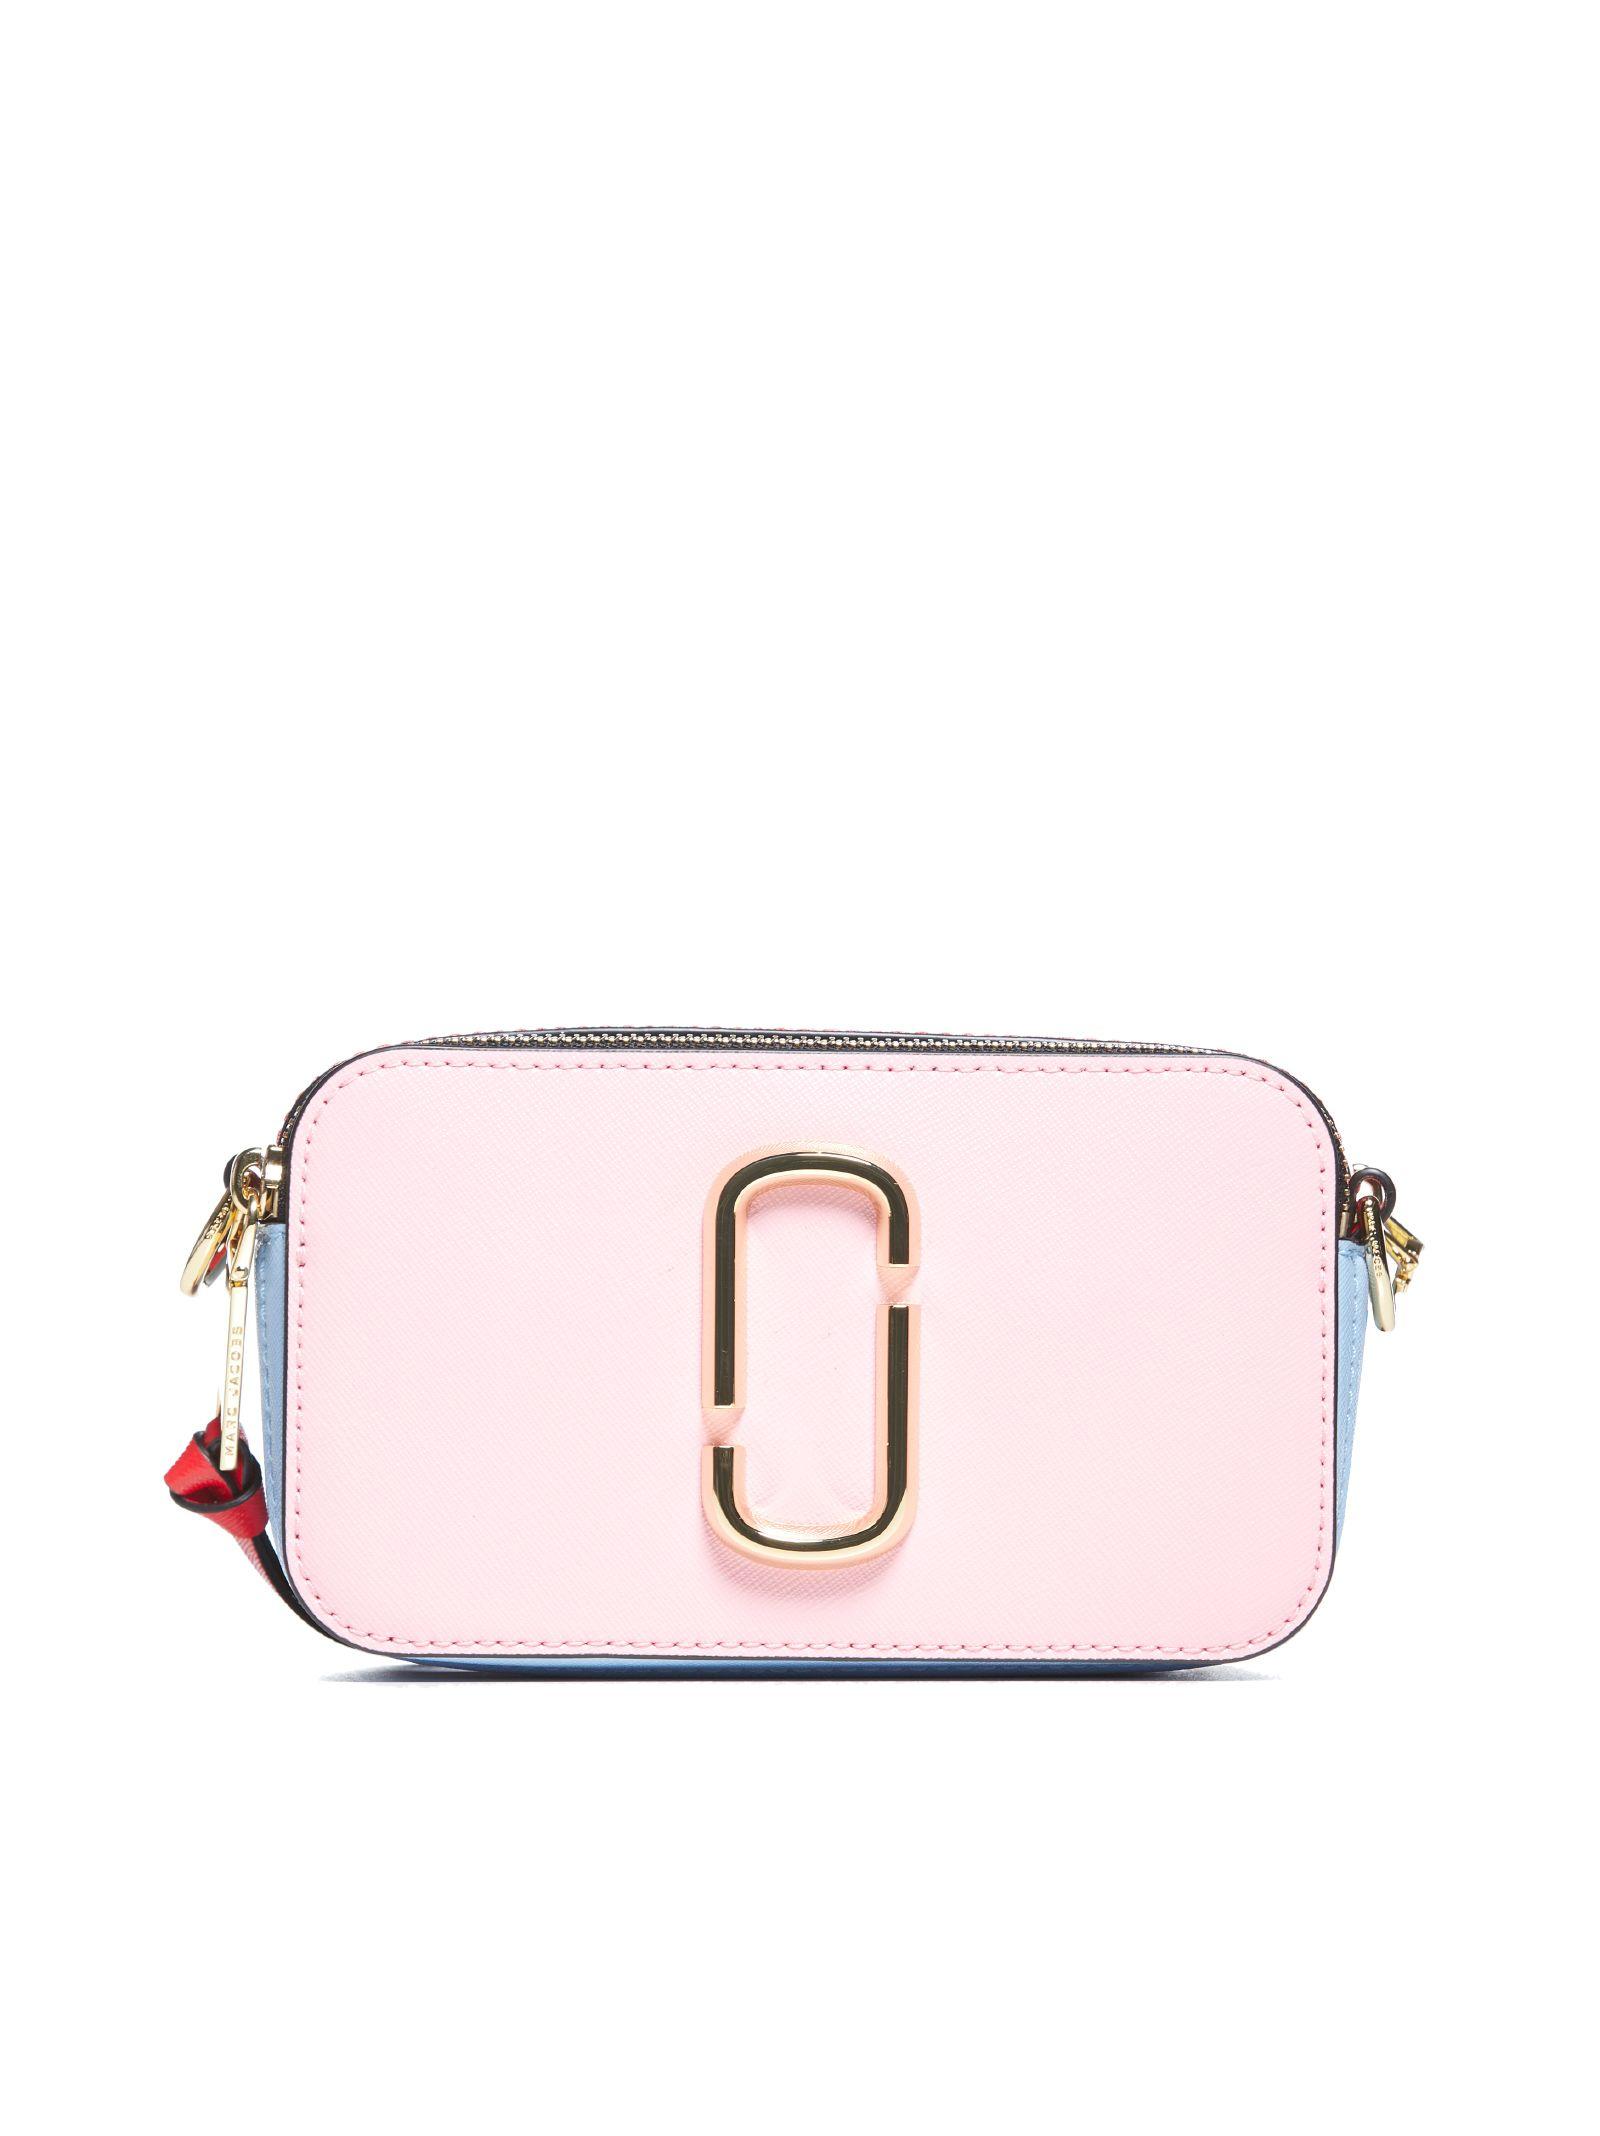 47c91561554 Marc Jacobs Marc Jacobs Clutch - Tart pink multi - 10969306 | italist